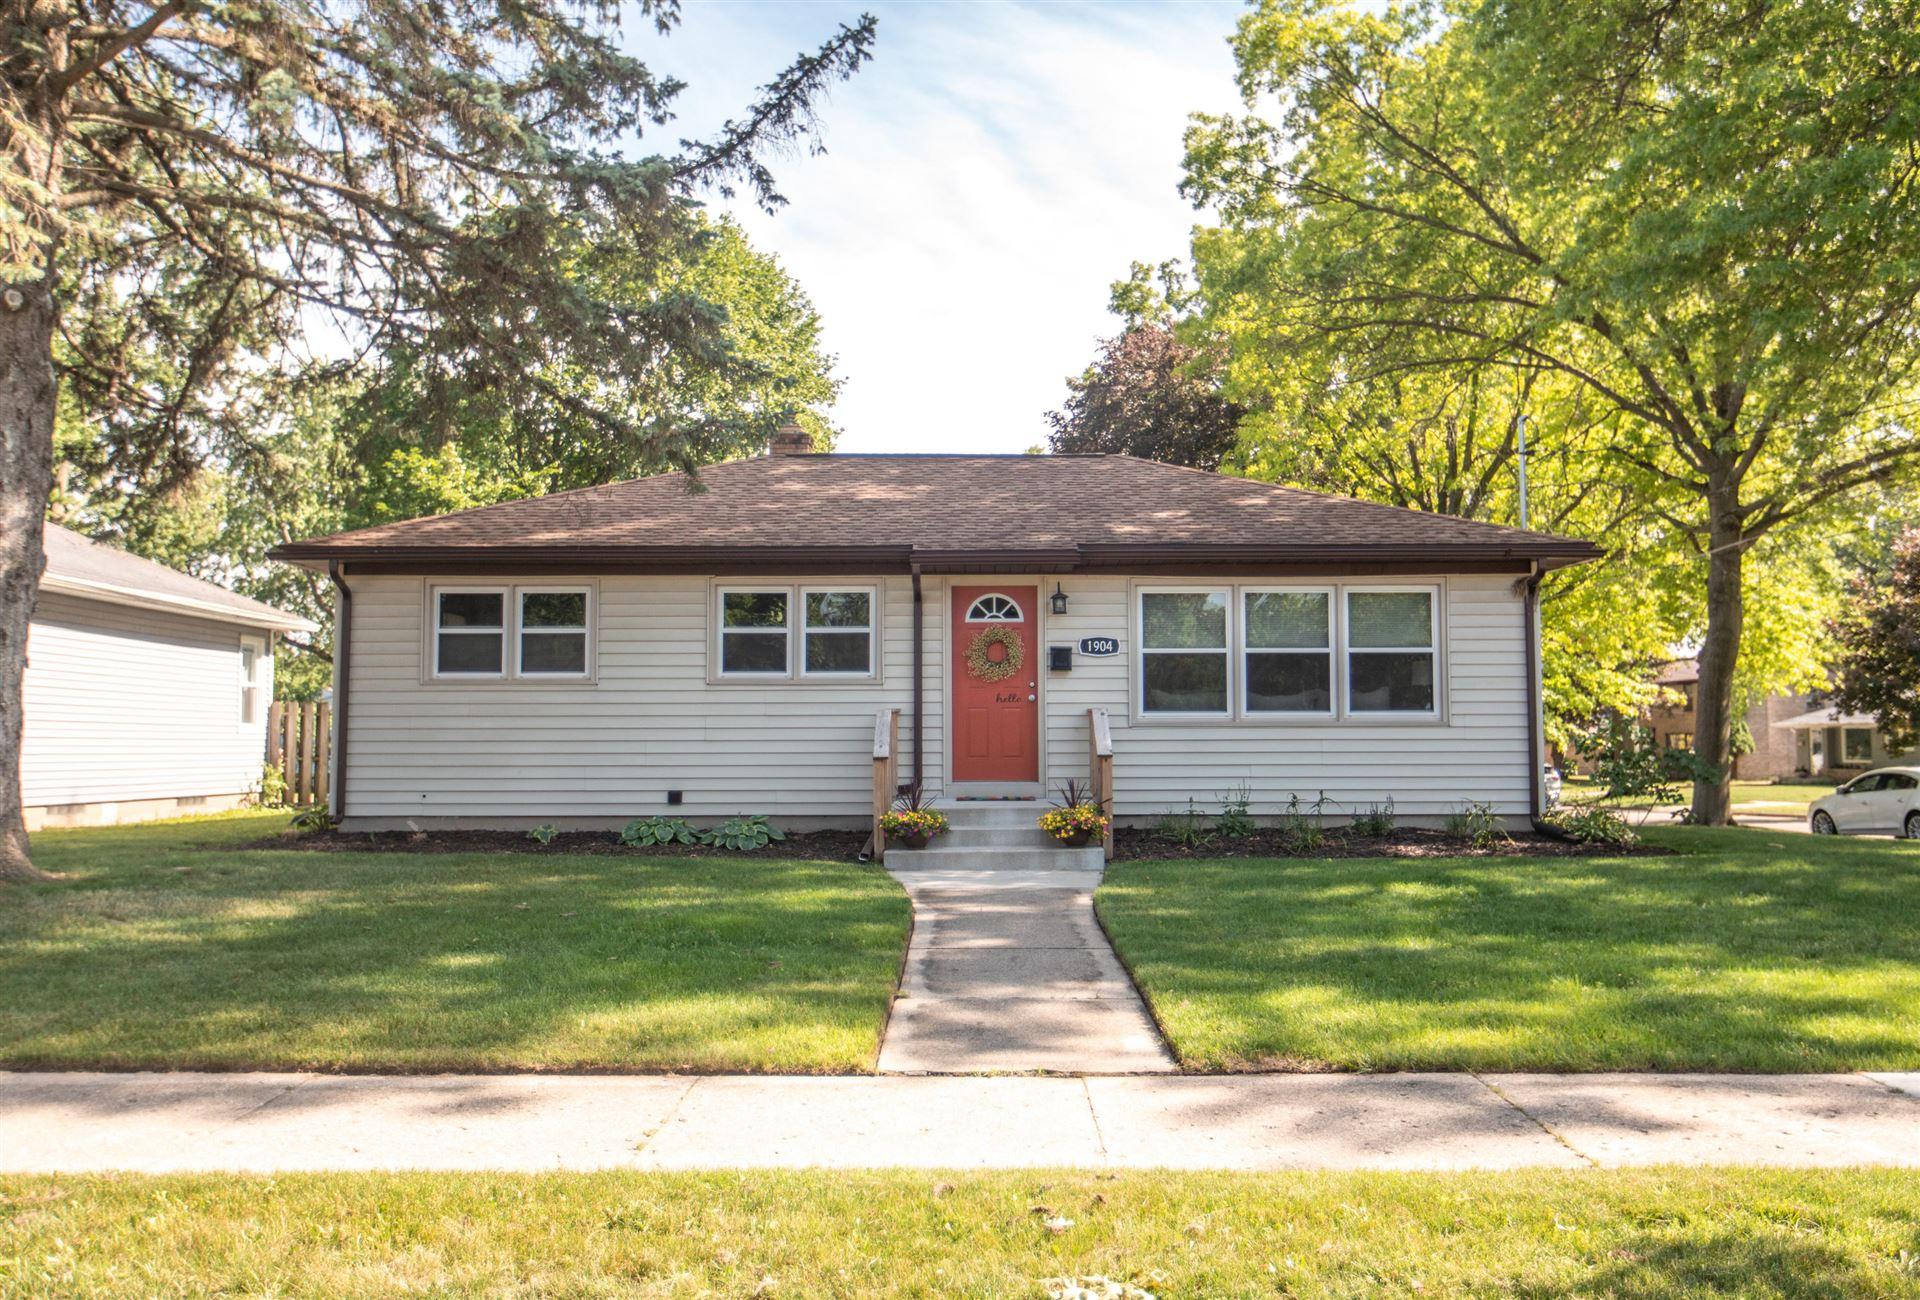 1904 Griggs Street Street SE, Grand Rapids, MI 49506 - MLS#: 21102005